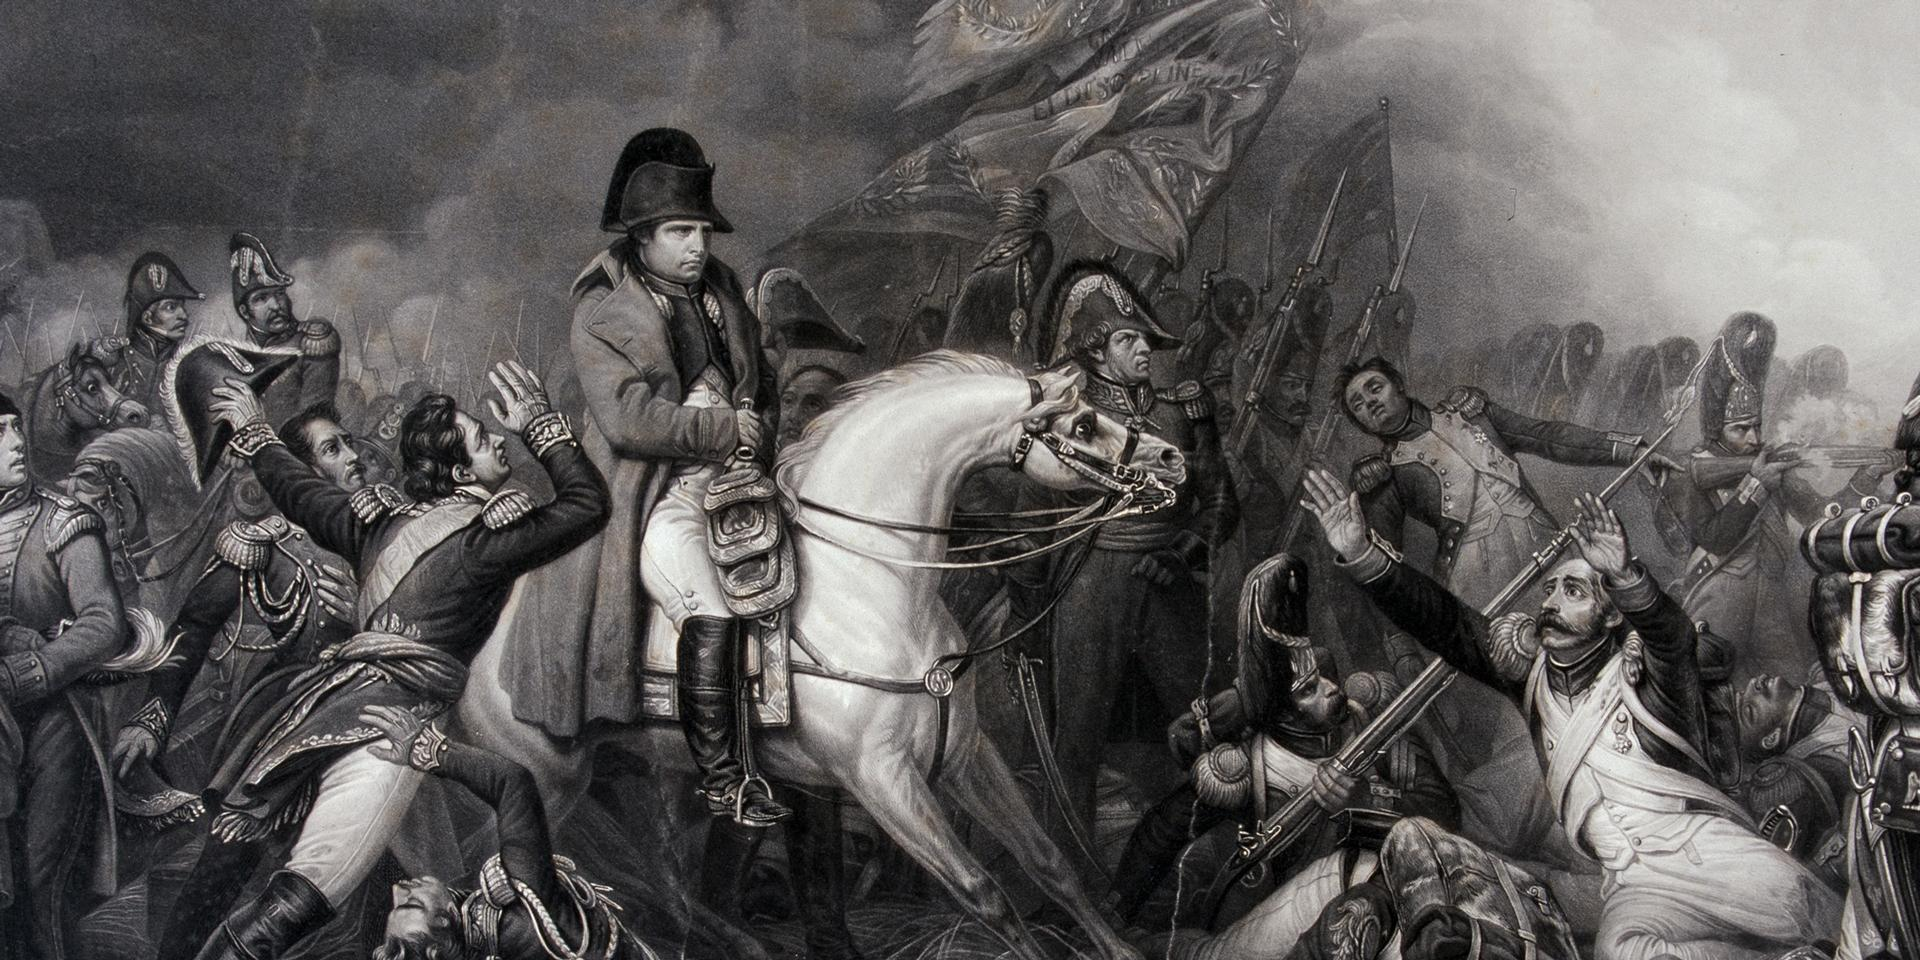 Napoleon at Waterloo, 1815